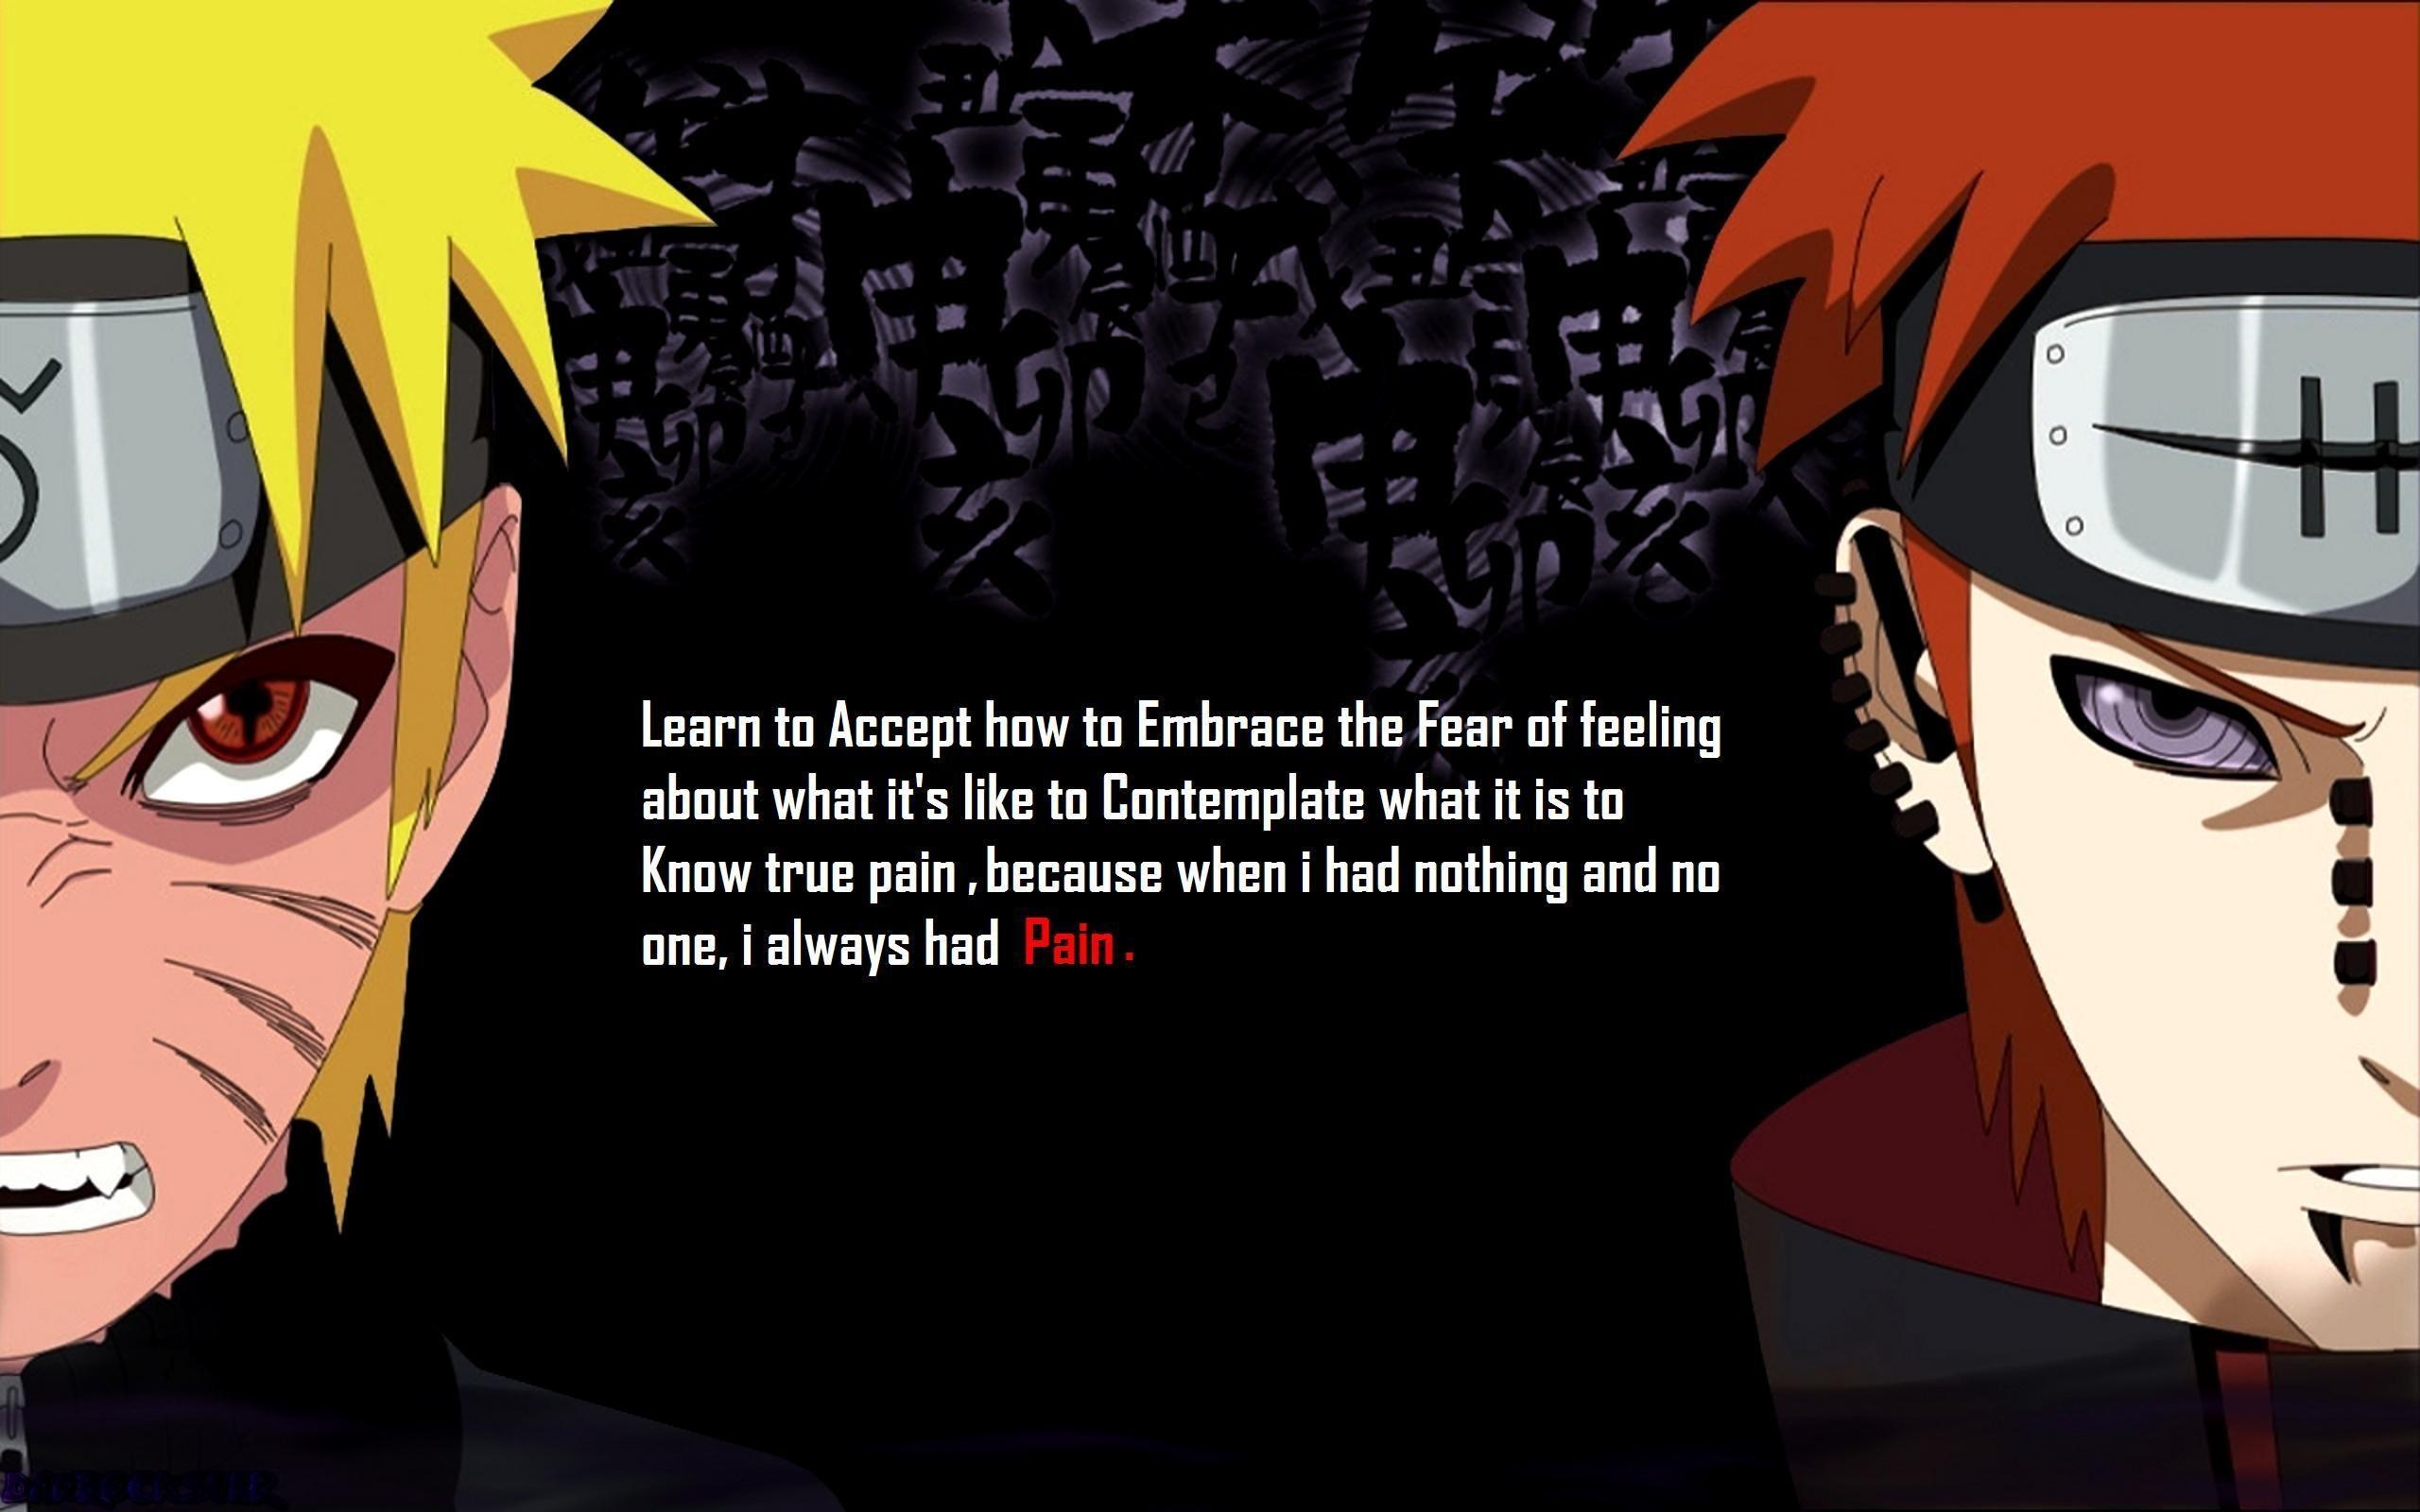 Pain Naruto Quotes Wallpapers   Top Pain Naruto Quotes 2560x1600